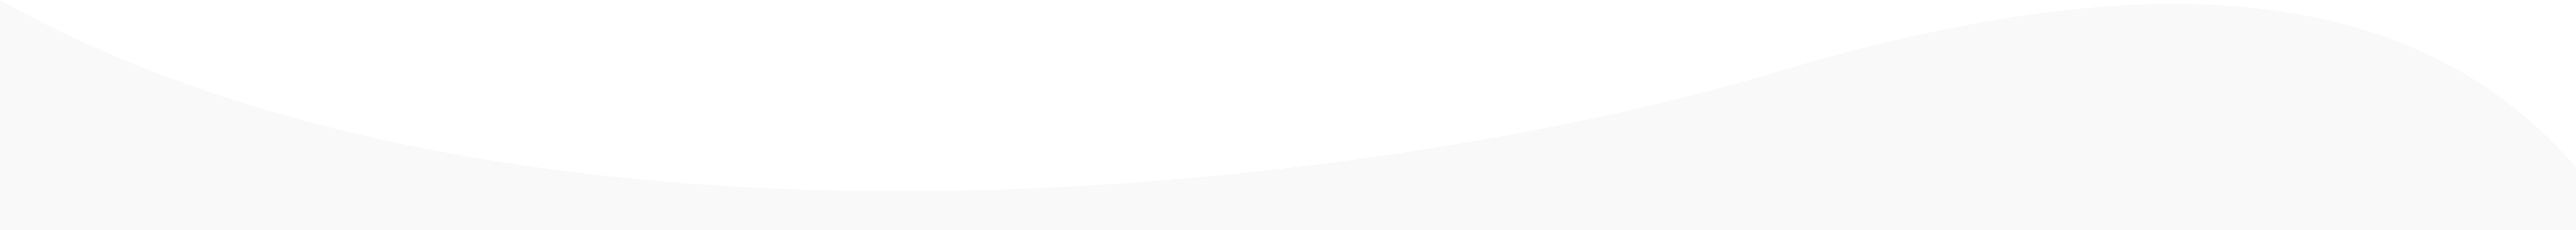 hero-wave-gray-reverse